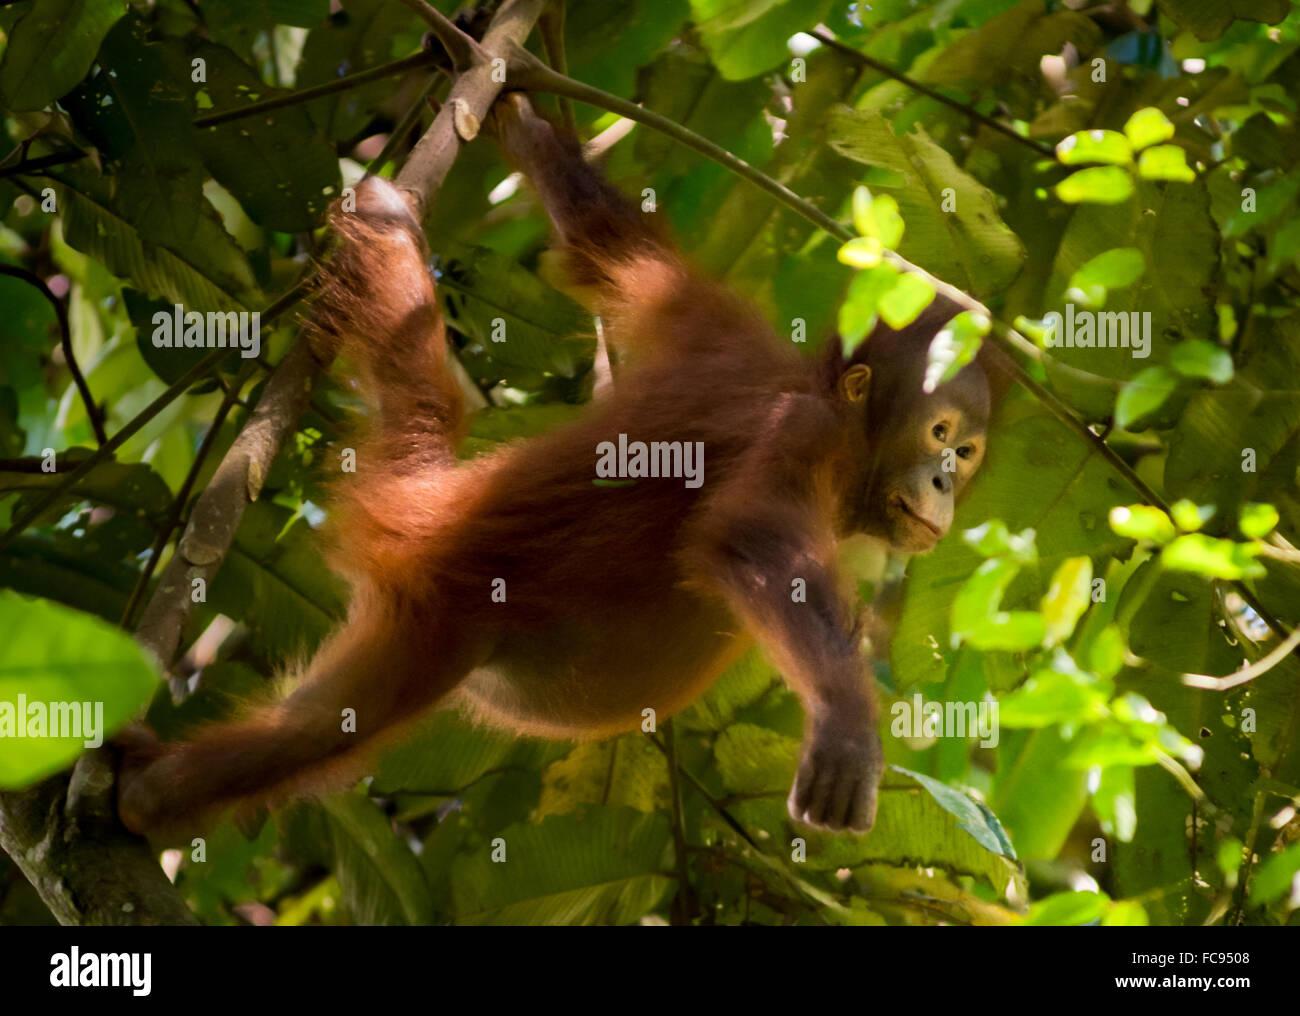 Giovani bornean orangutan (Pongo pygmaeus morio) nel selvaggio. Kutai National Park, Indonesia. Immagini Stock